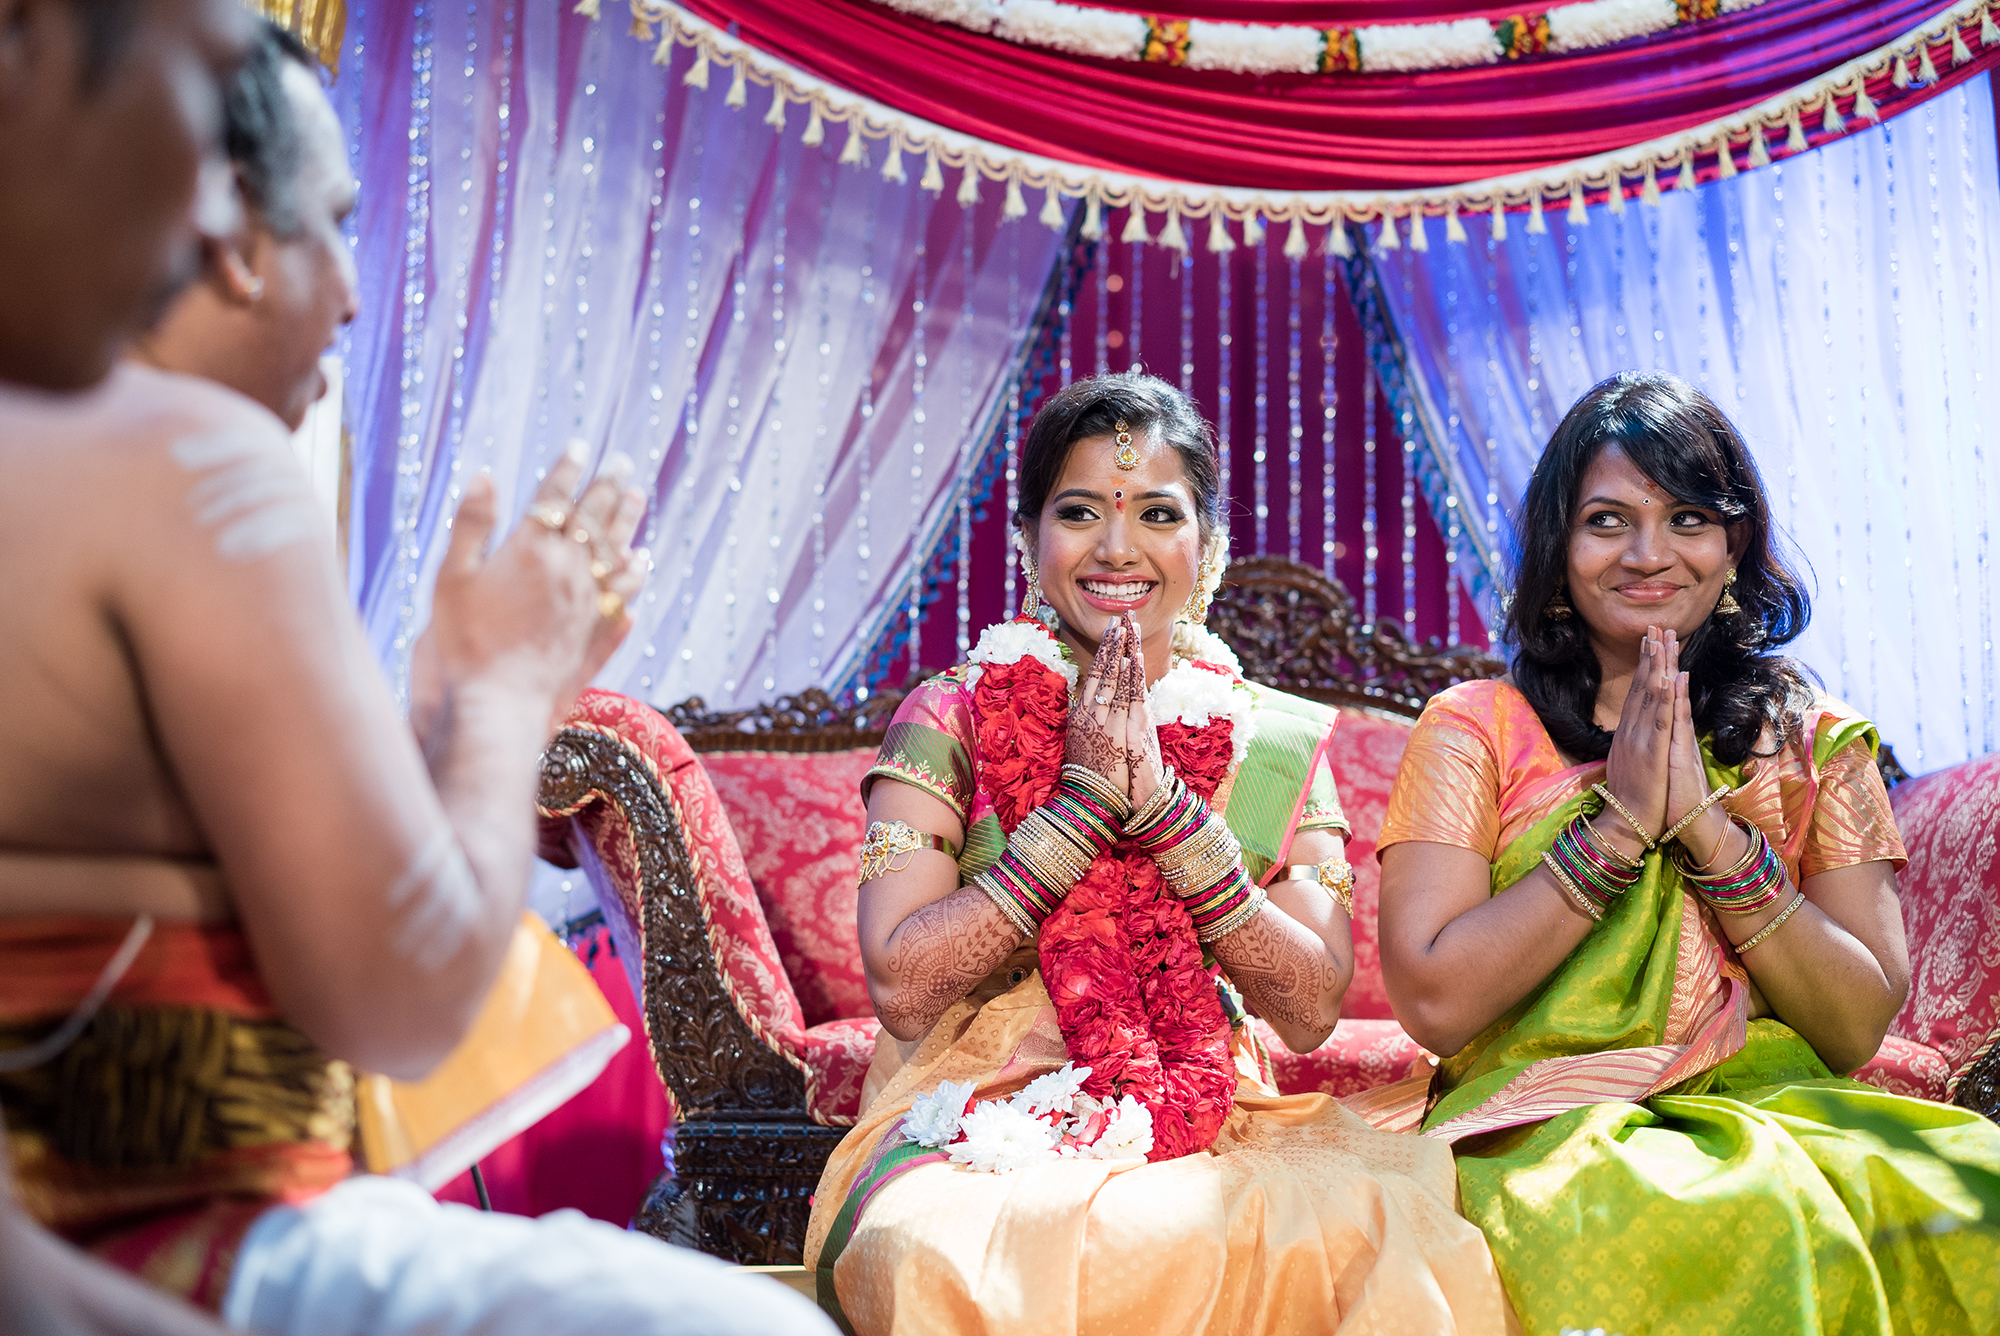 Bride and bridesmaid smiling